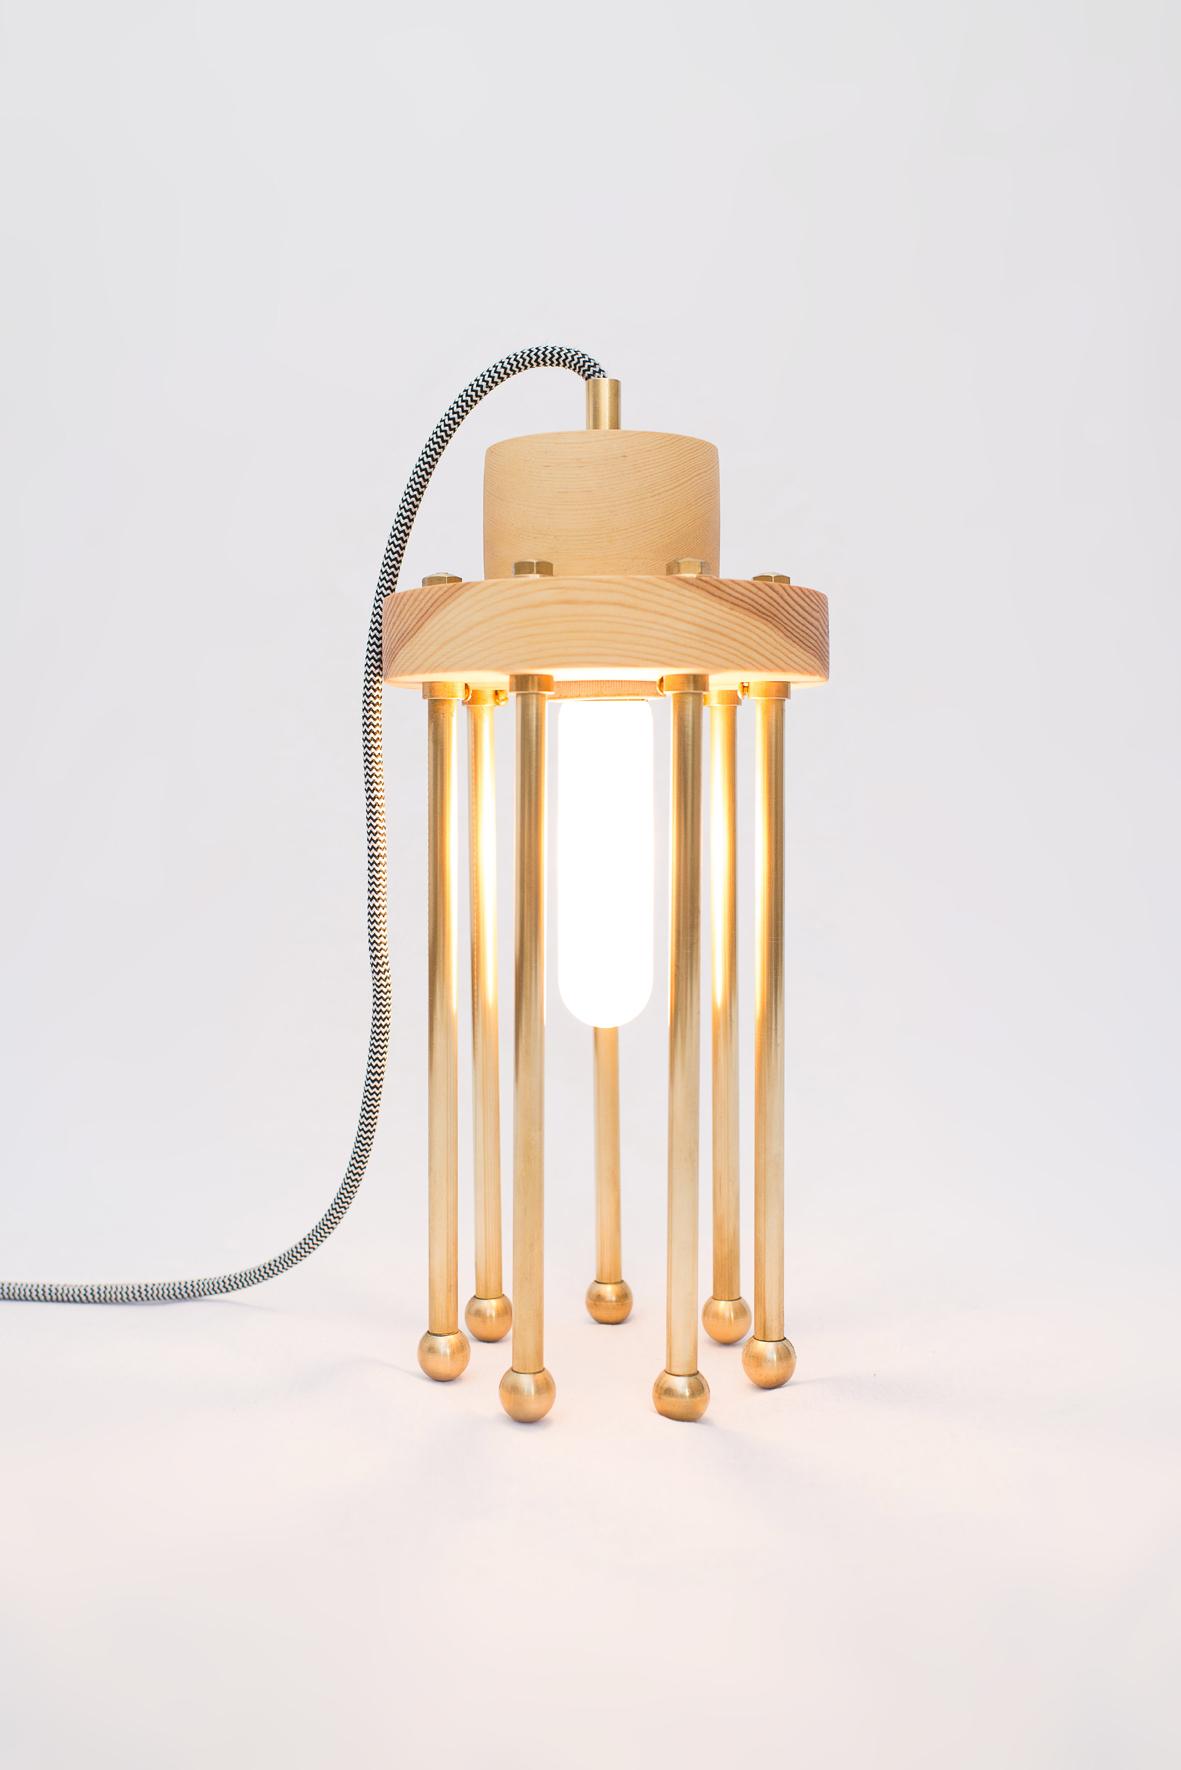 a6_mdba_mdby_manufactured_wood_lamps_antonitoymanolin_artro